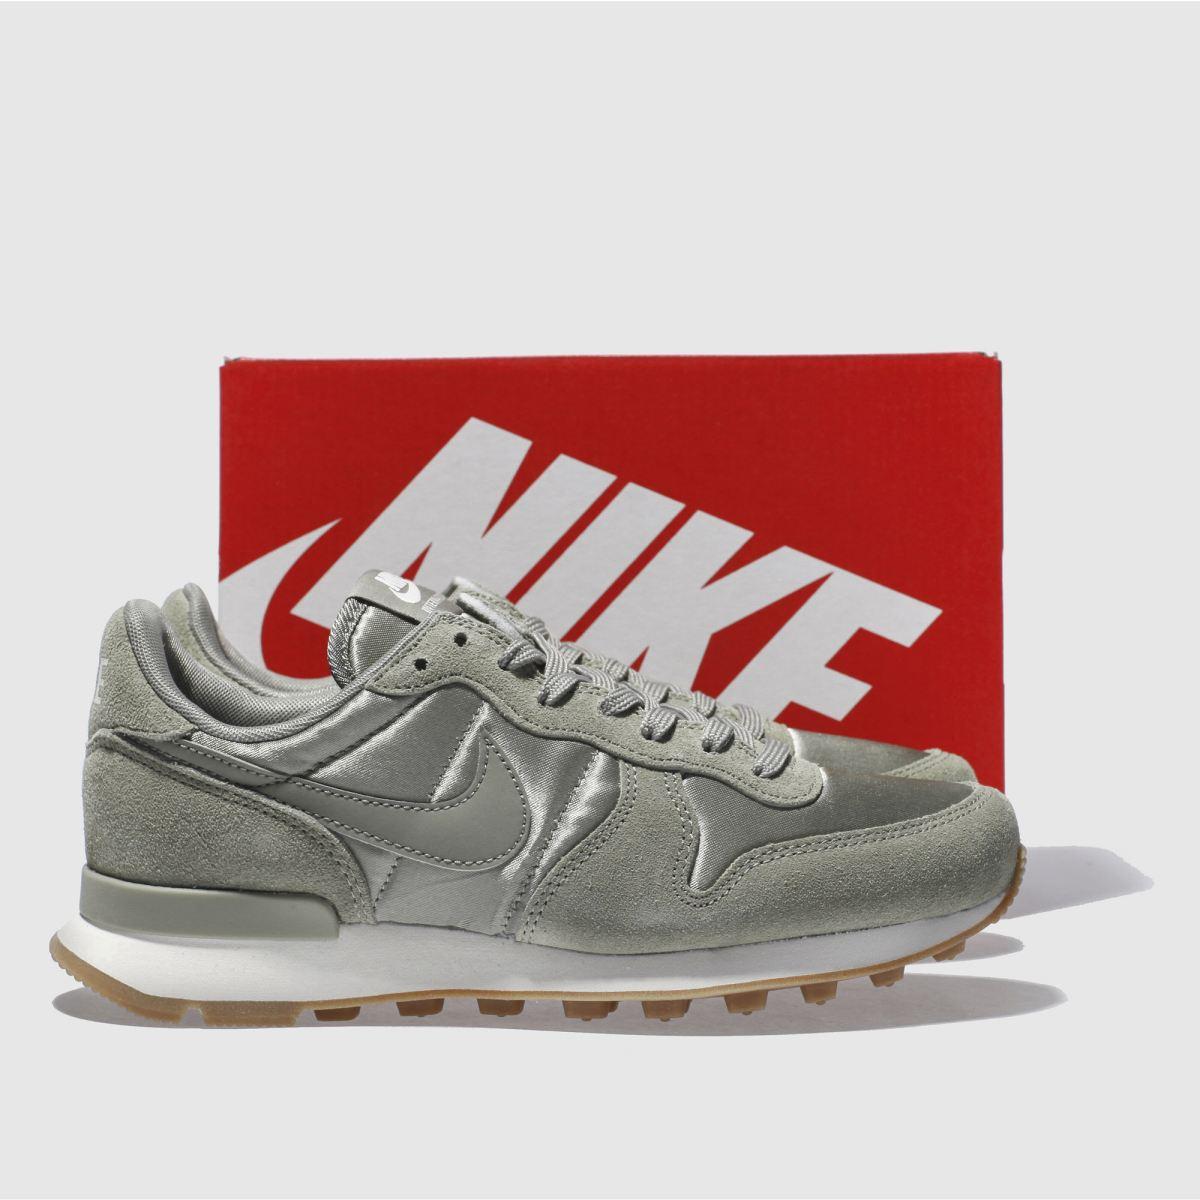 Damen schuh Khaki nike Internationalist Sneaker | schuh Damen Gute Qualität beliebte Schuhe 41adfe